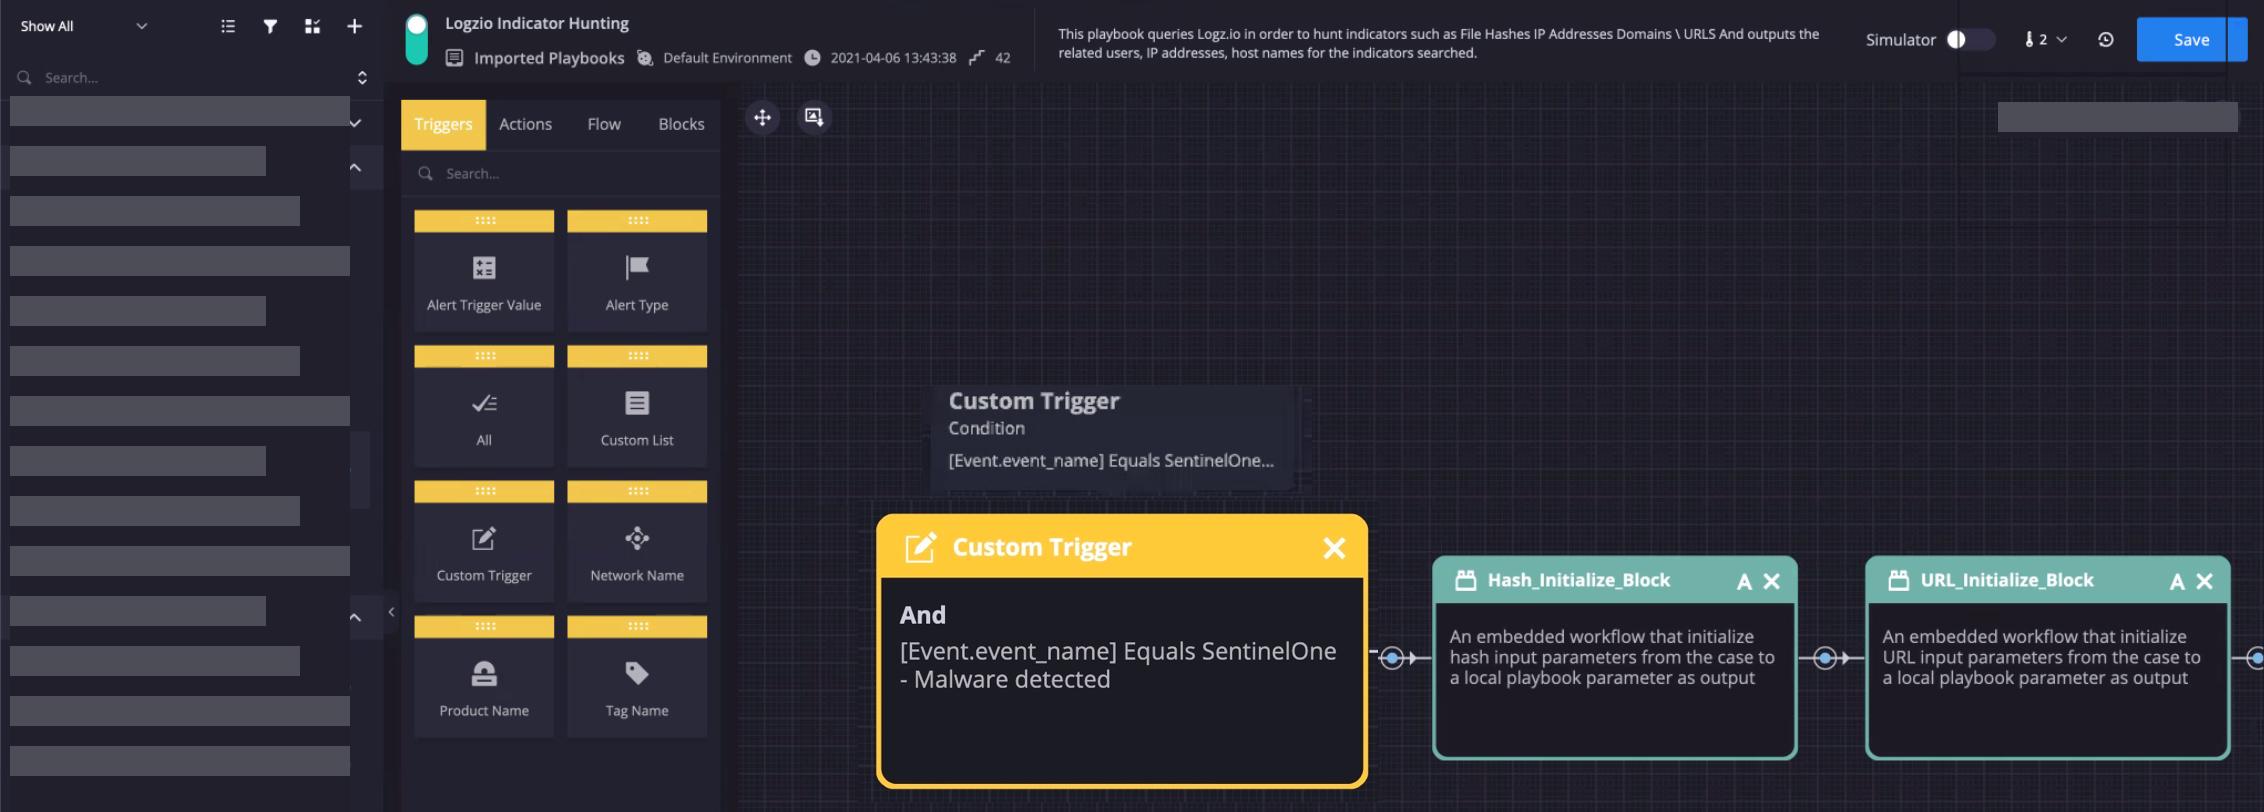 Configured Custom Trigger